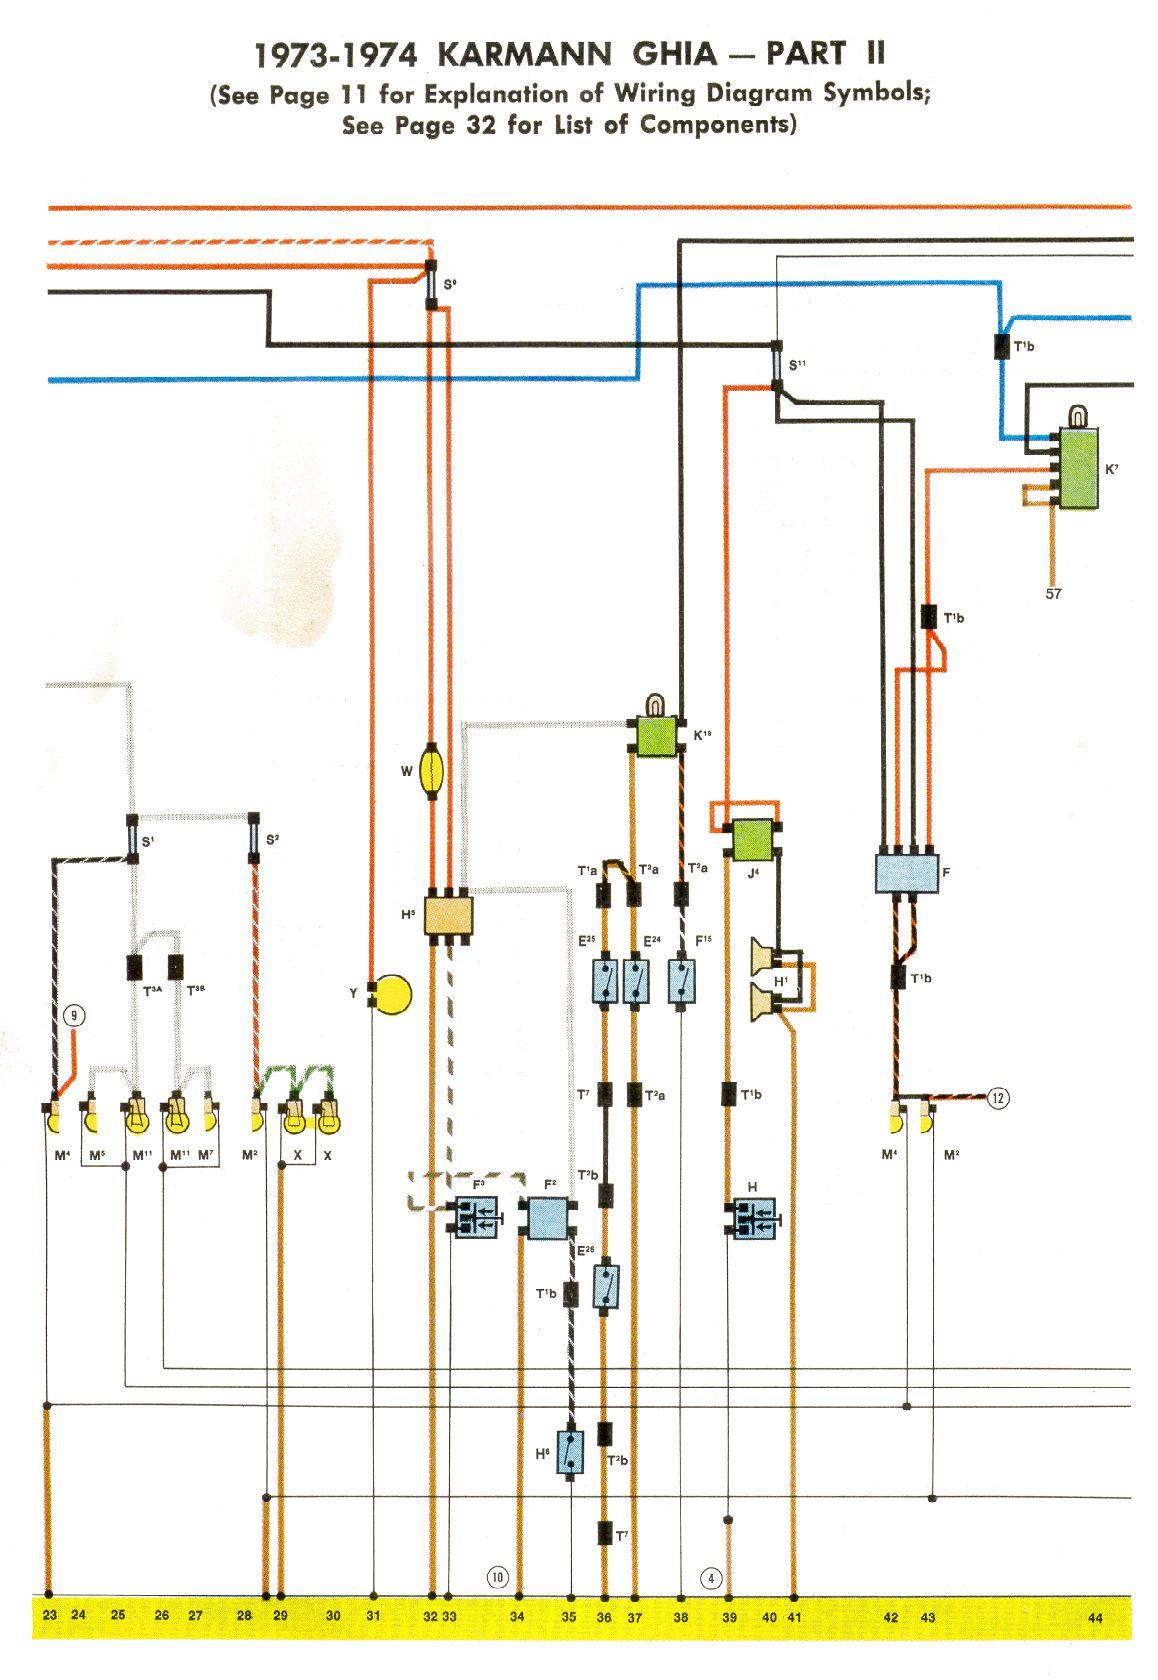 1973 karmann ghia wiring diagram wiring diagrams schematics karmann ghia schaltplne 1973 chevrolet wiring diagram wiring diagrams for 1970 vw fastback 1973 karmann ghia wiring diagram 39 1968 vw wiring diagram 1973 asfbconference2016 Choice Image